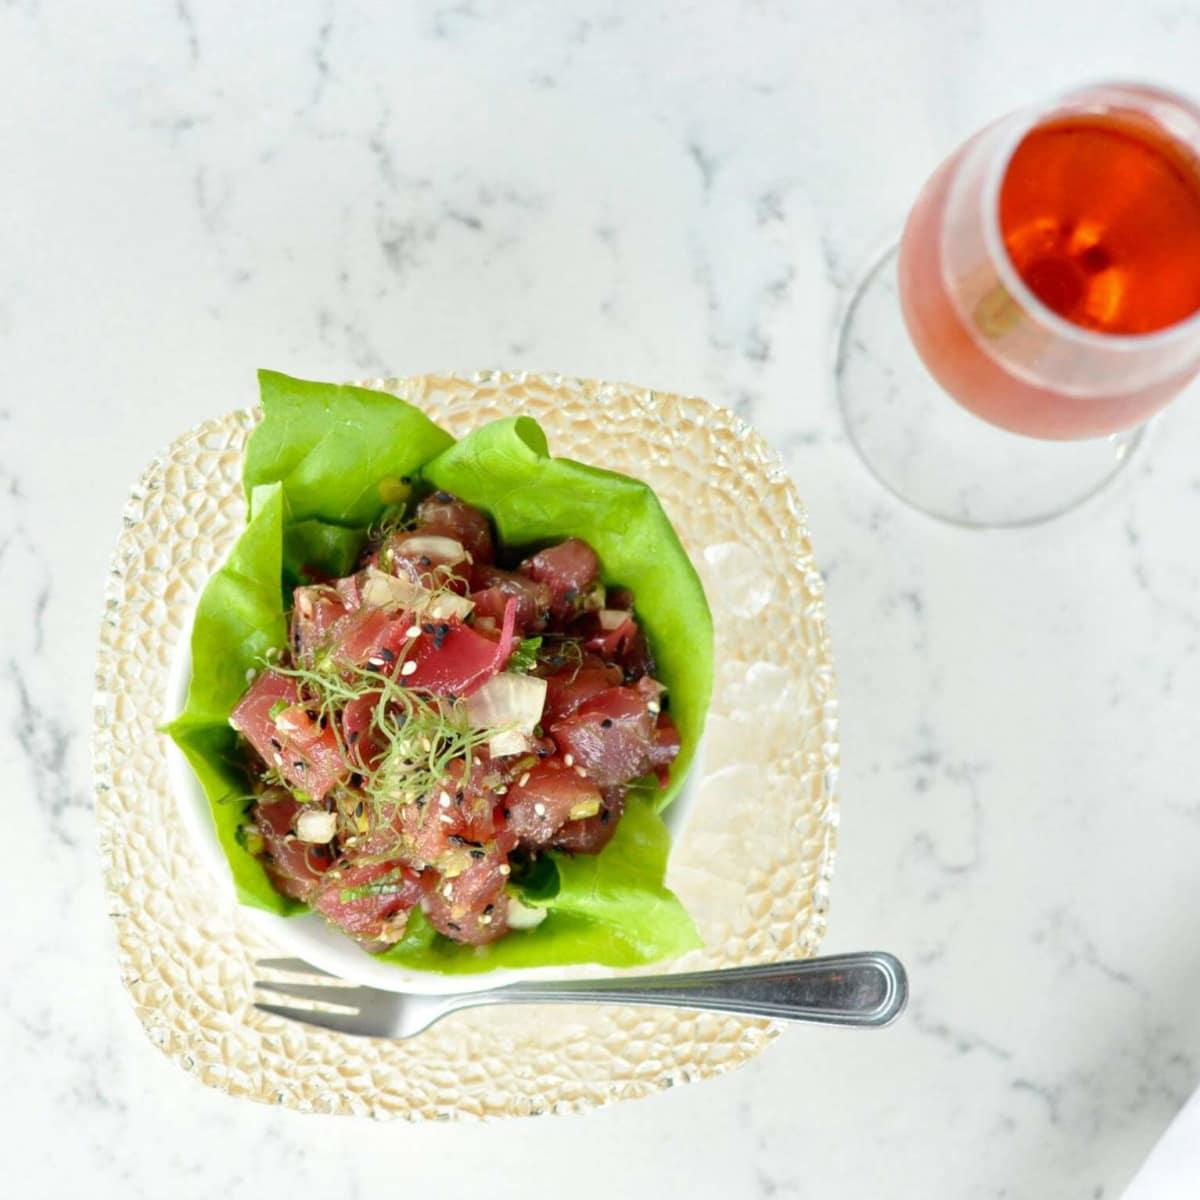 Mongers Market poke lettuce